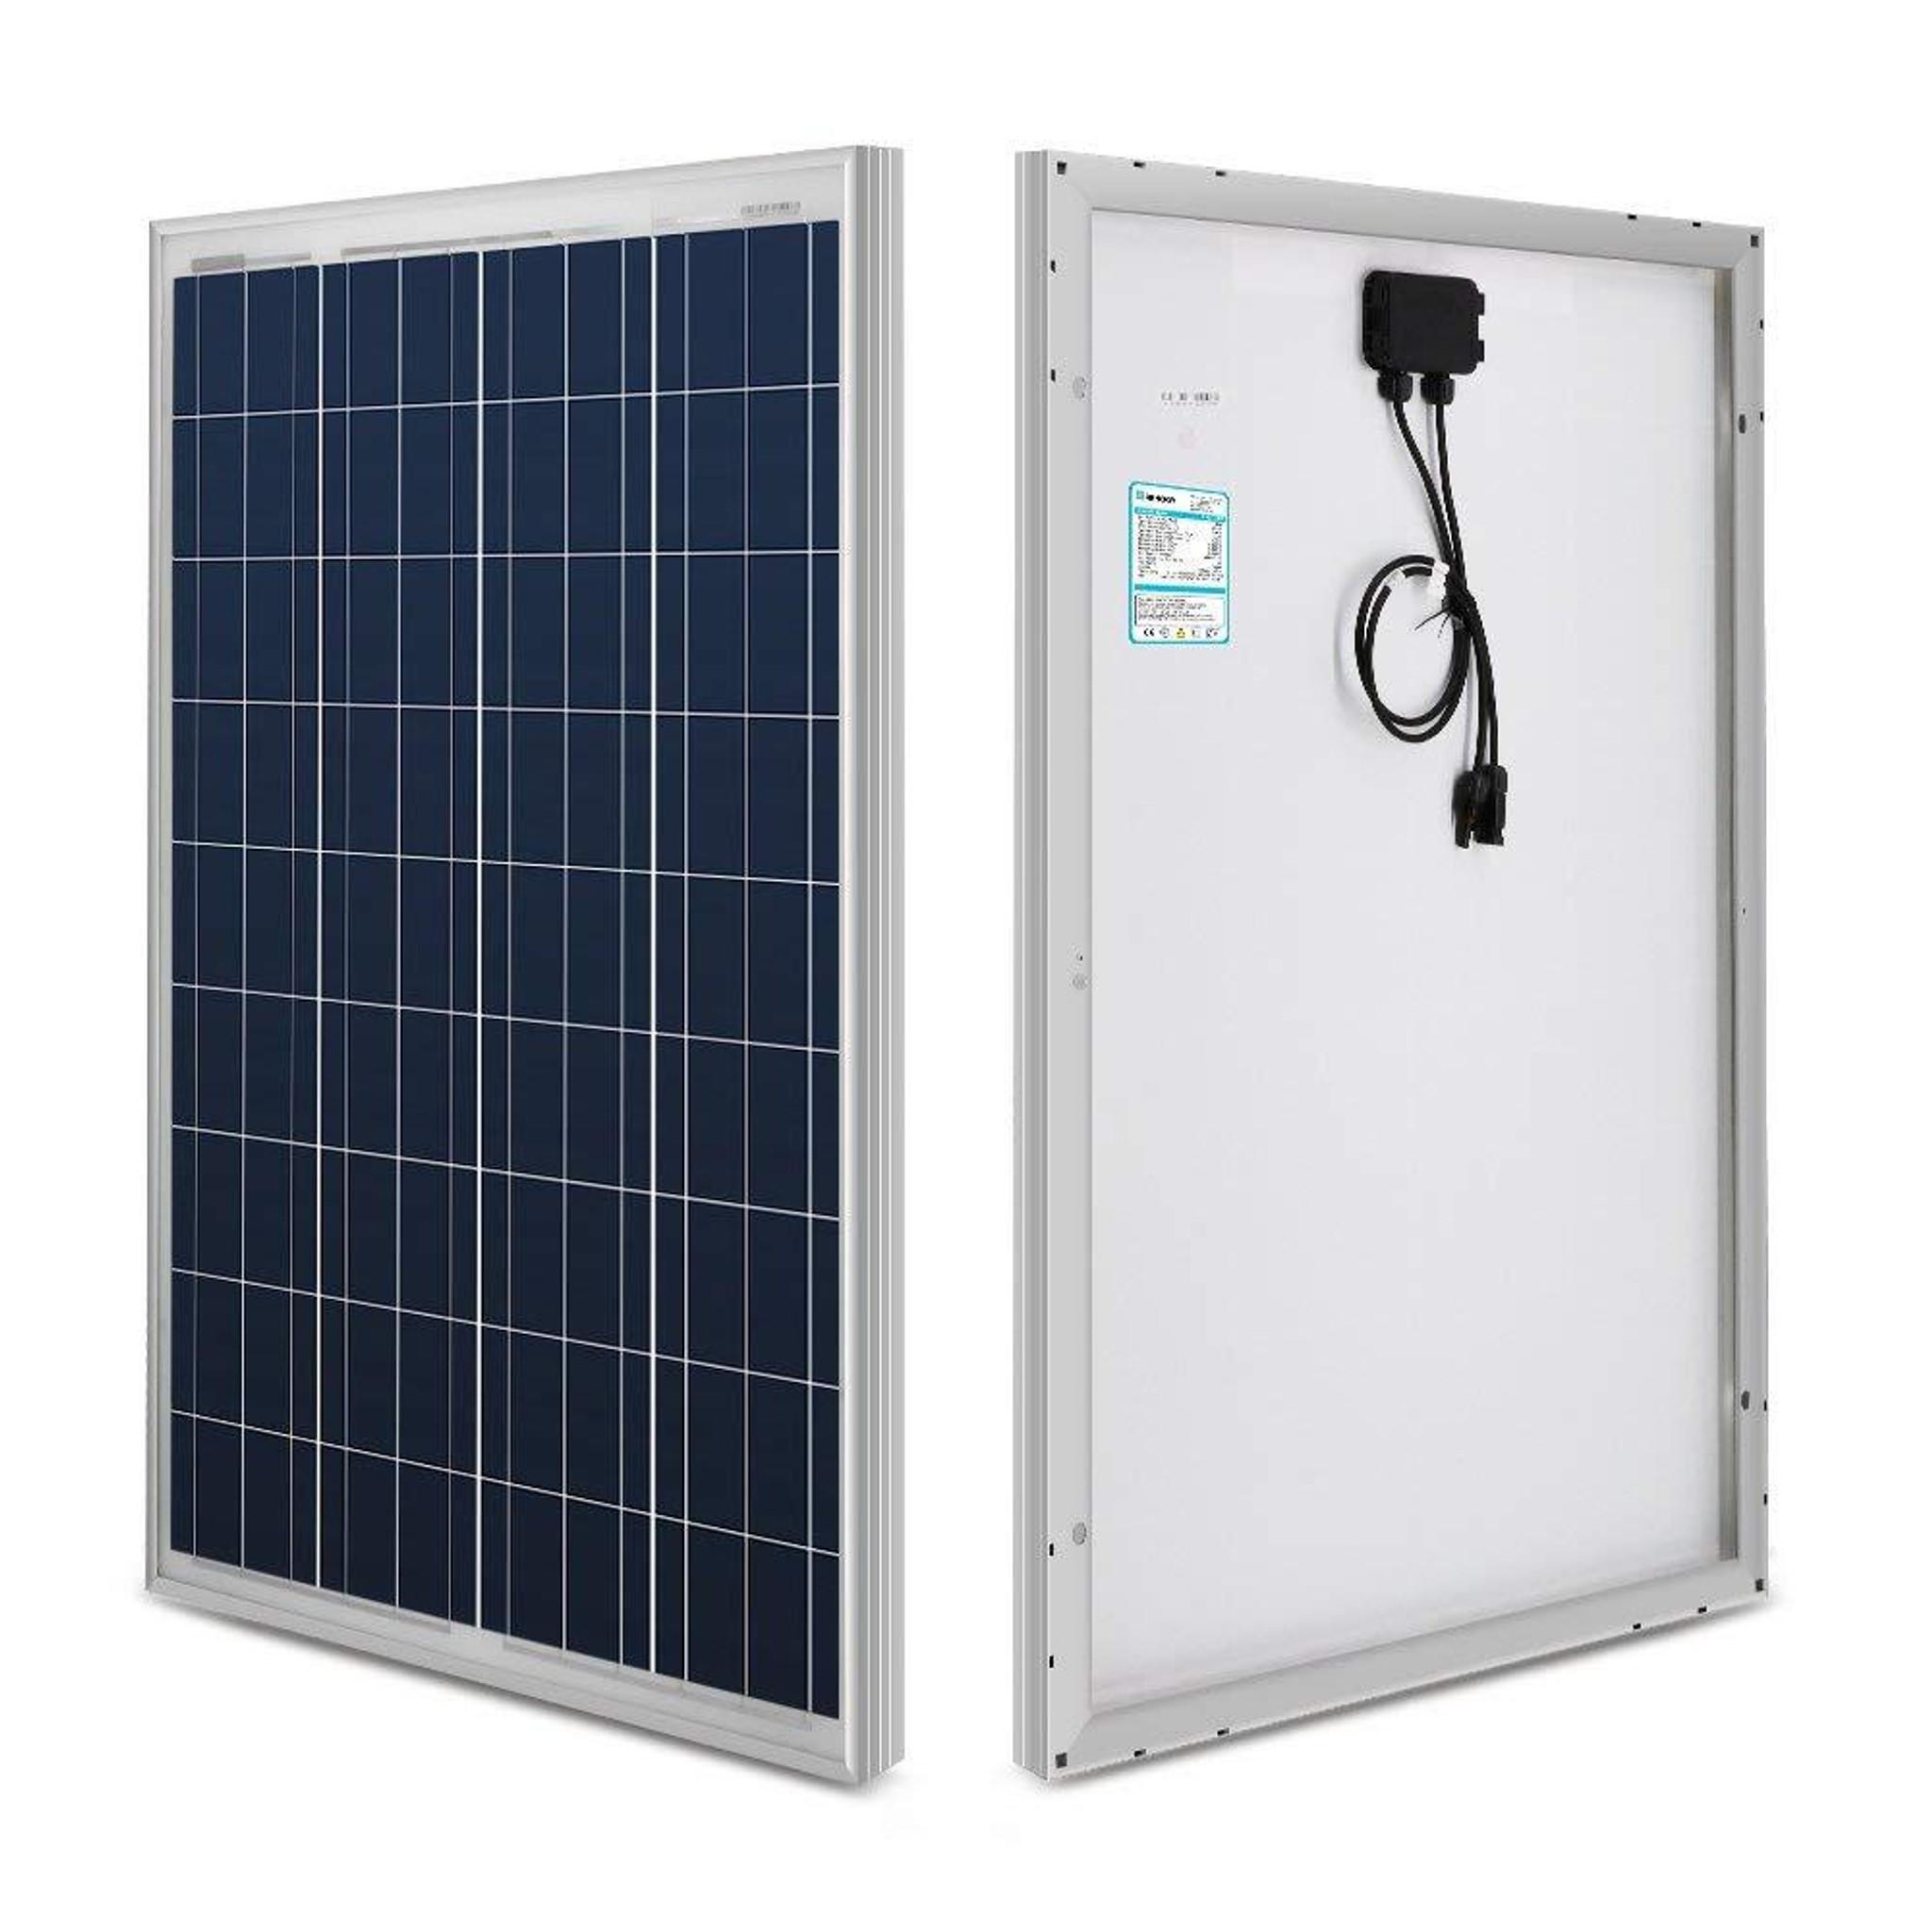 Renogy 100 Watt 12 Volt Polycrystalline Solar Starter Kit with 20A Rover MPPT Charge Controller